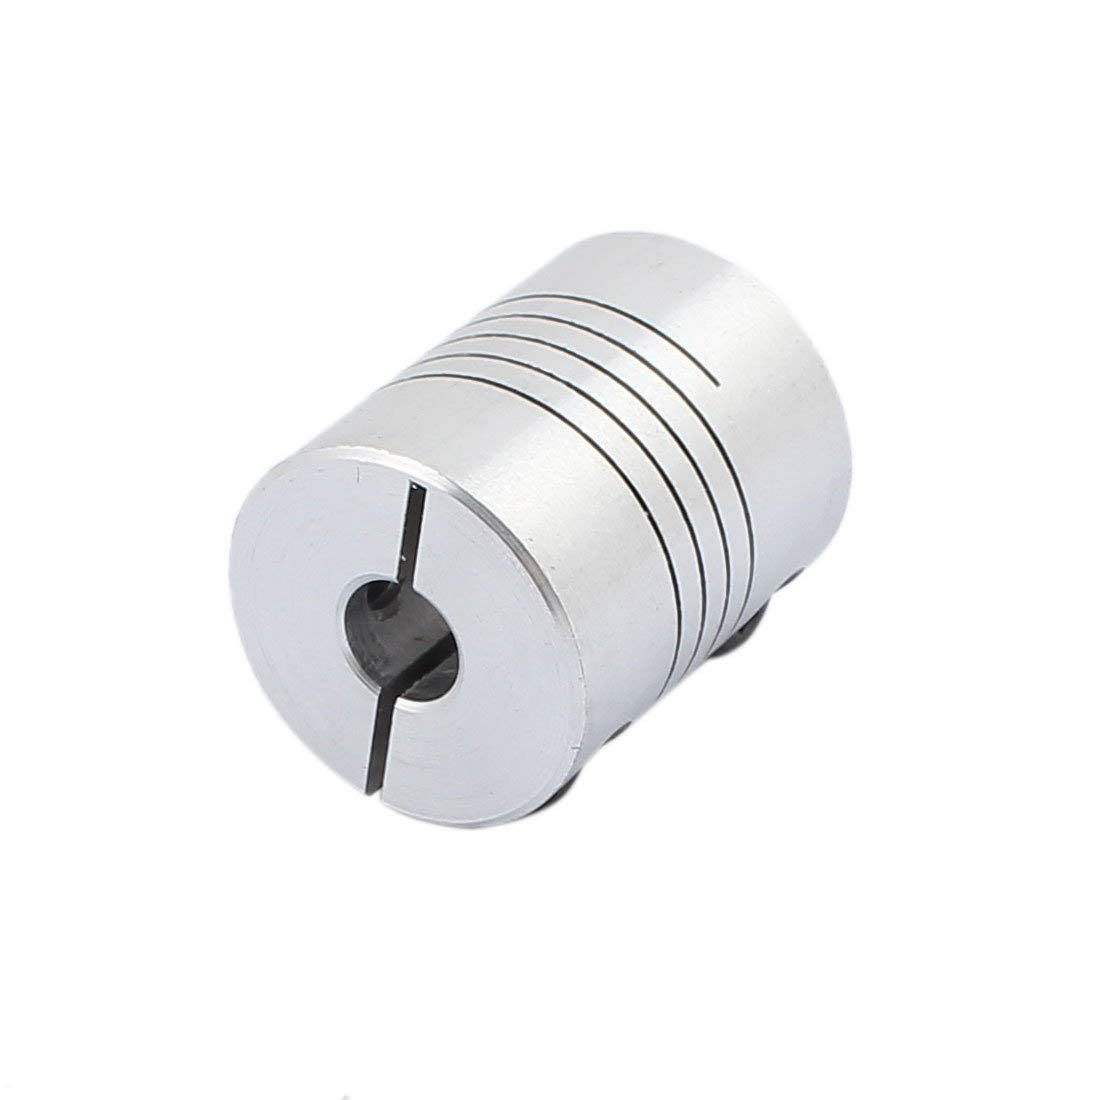 Xnrtop 6mm to 6.35mm Shaft Coupling 25mm Length 20mm Diameter Stepper Motor Coupler Aluminum Alloy Joint Connector for 3D Printer CNC Machine DIY Encoder Pack of 2)